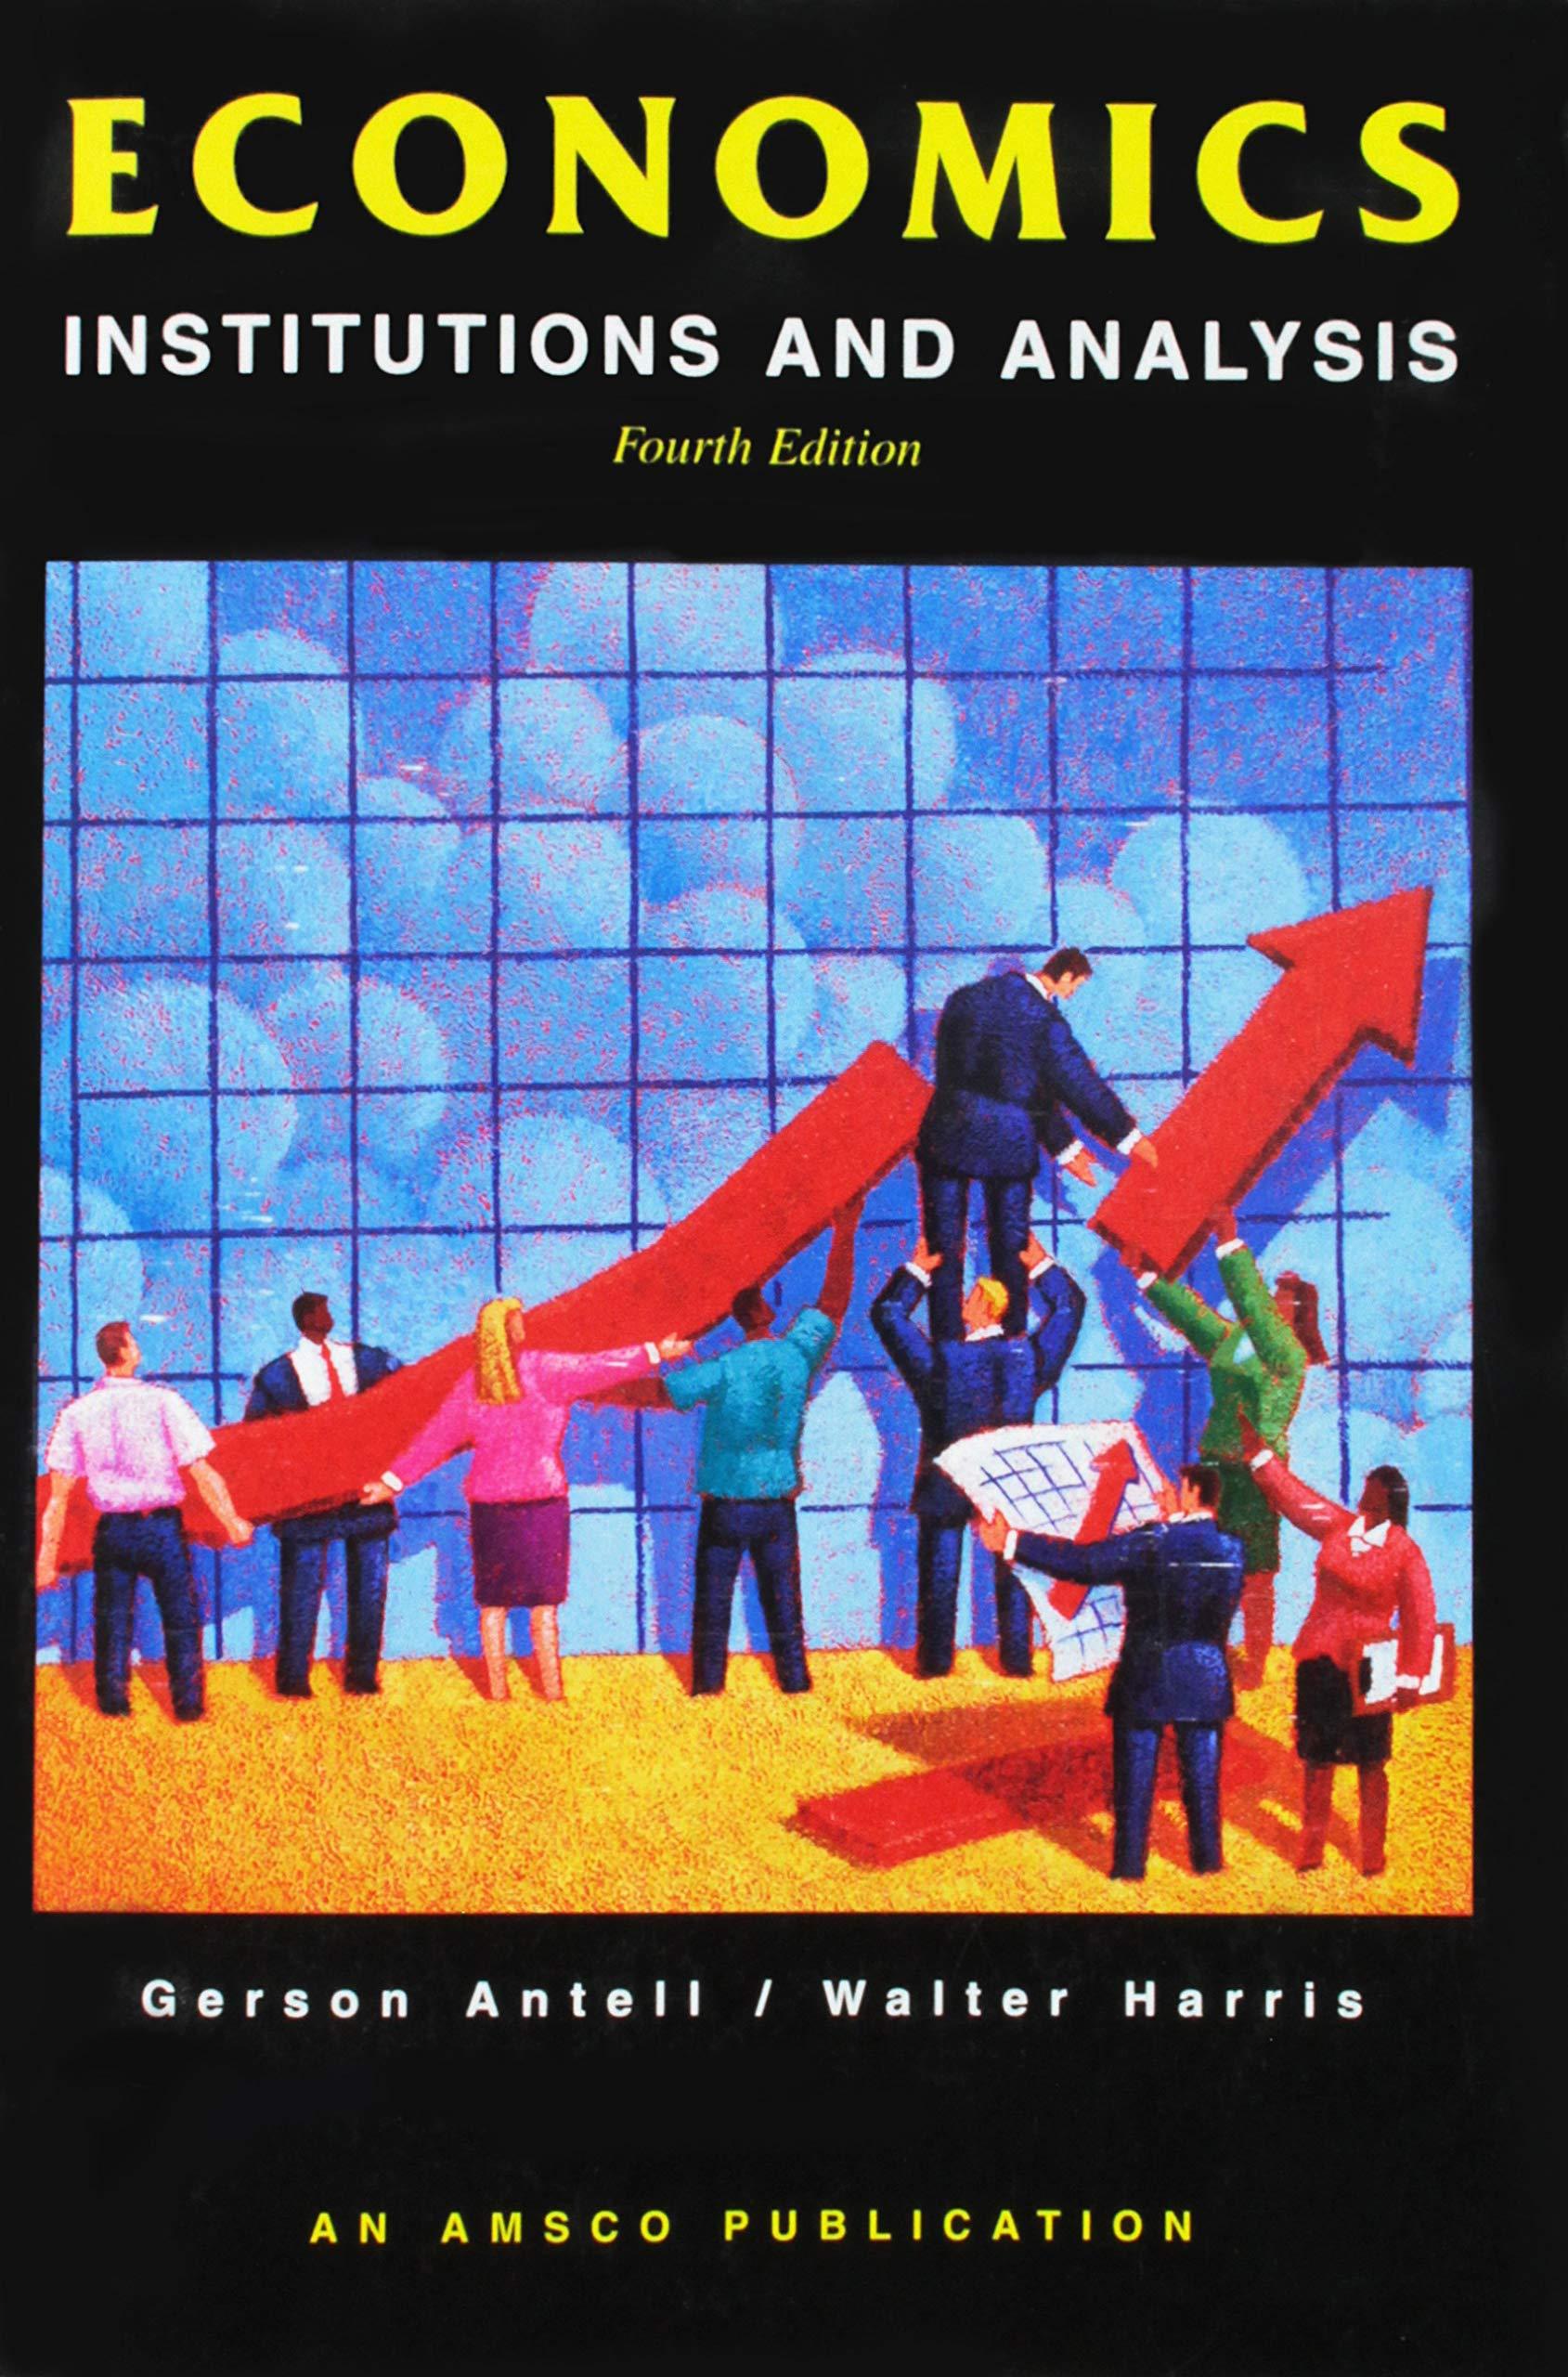 Economics: Institutions & Analysis: Gerson Antell